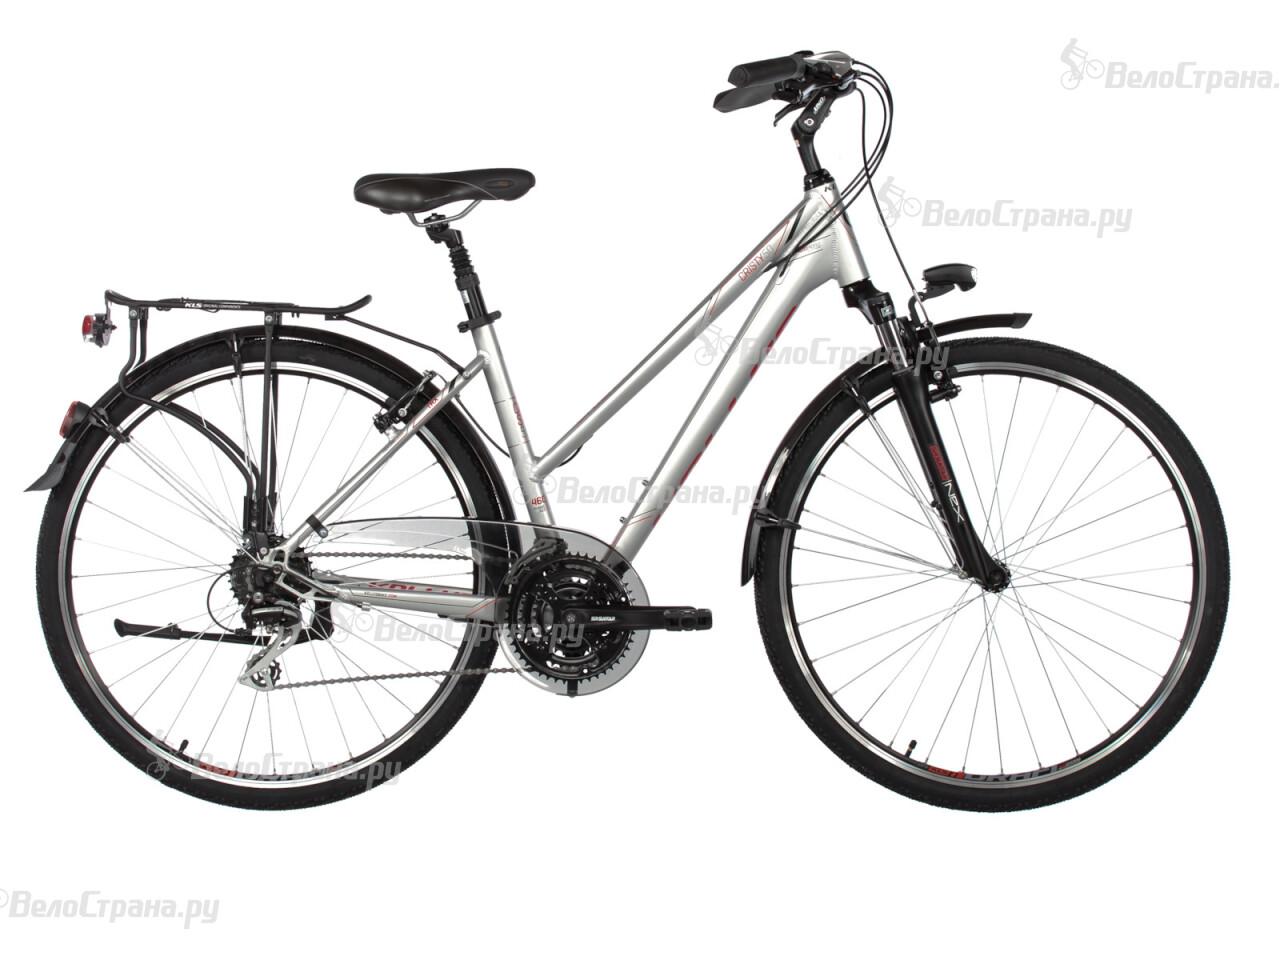 Велосипед Kellys CRISTY 50 (2017) велосипед krostek cristy 400 колеса 24 рама 14 голубой